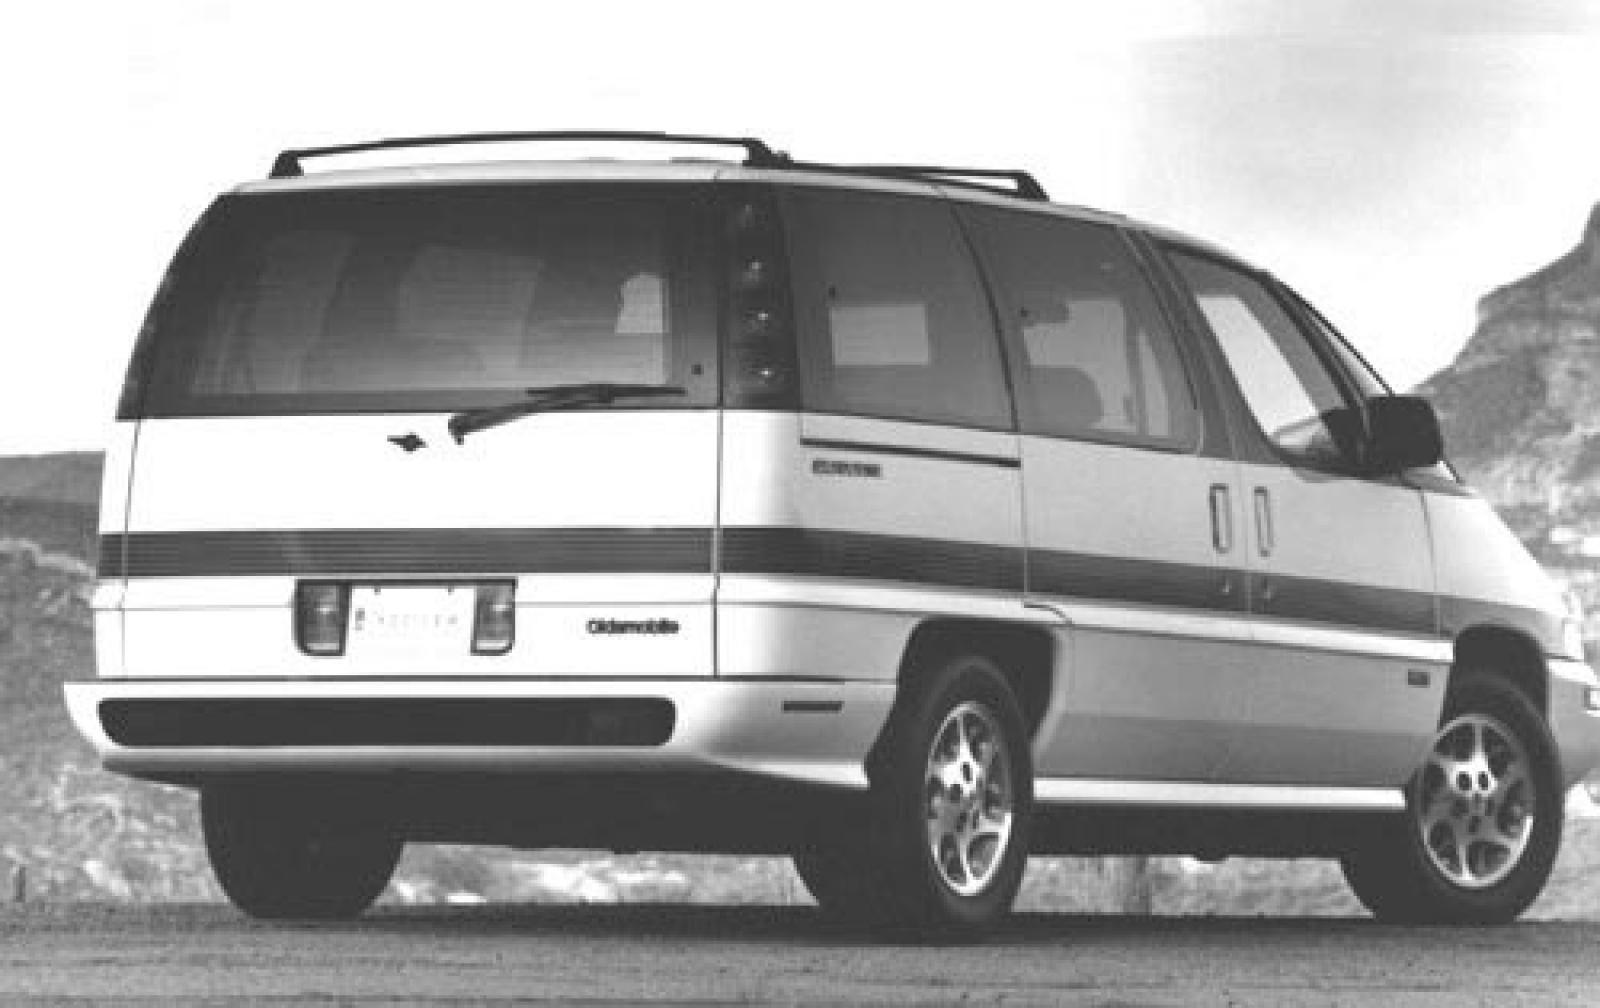 Oldsmobile Silhouette I 1989 - 1996 Minivan #2